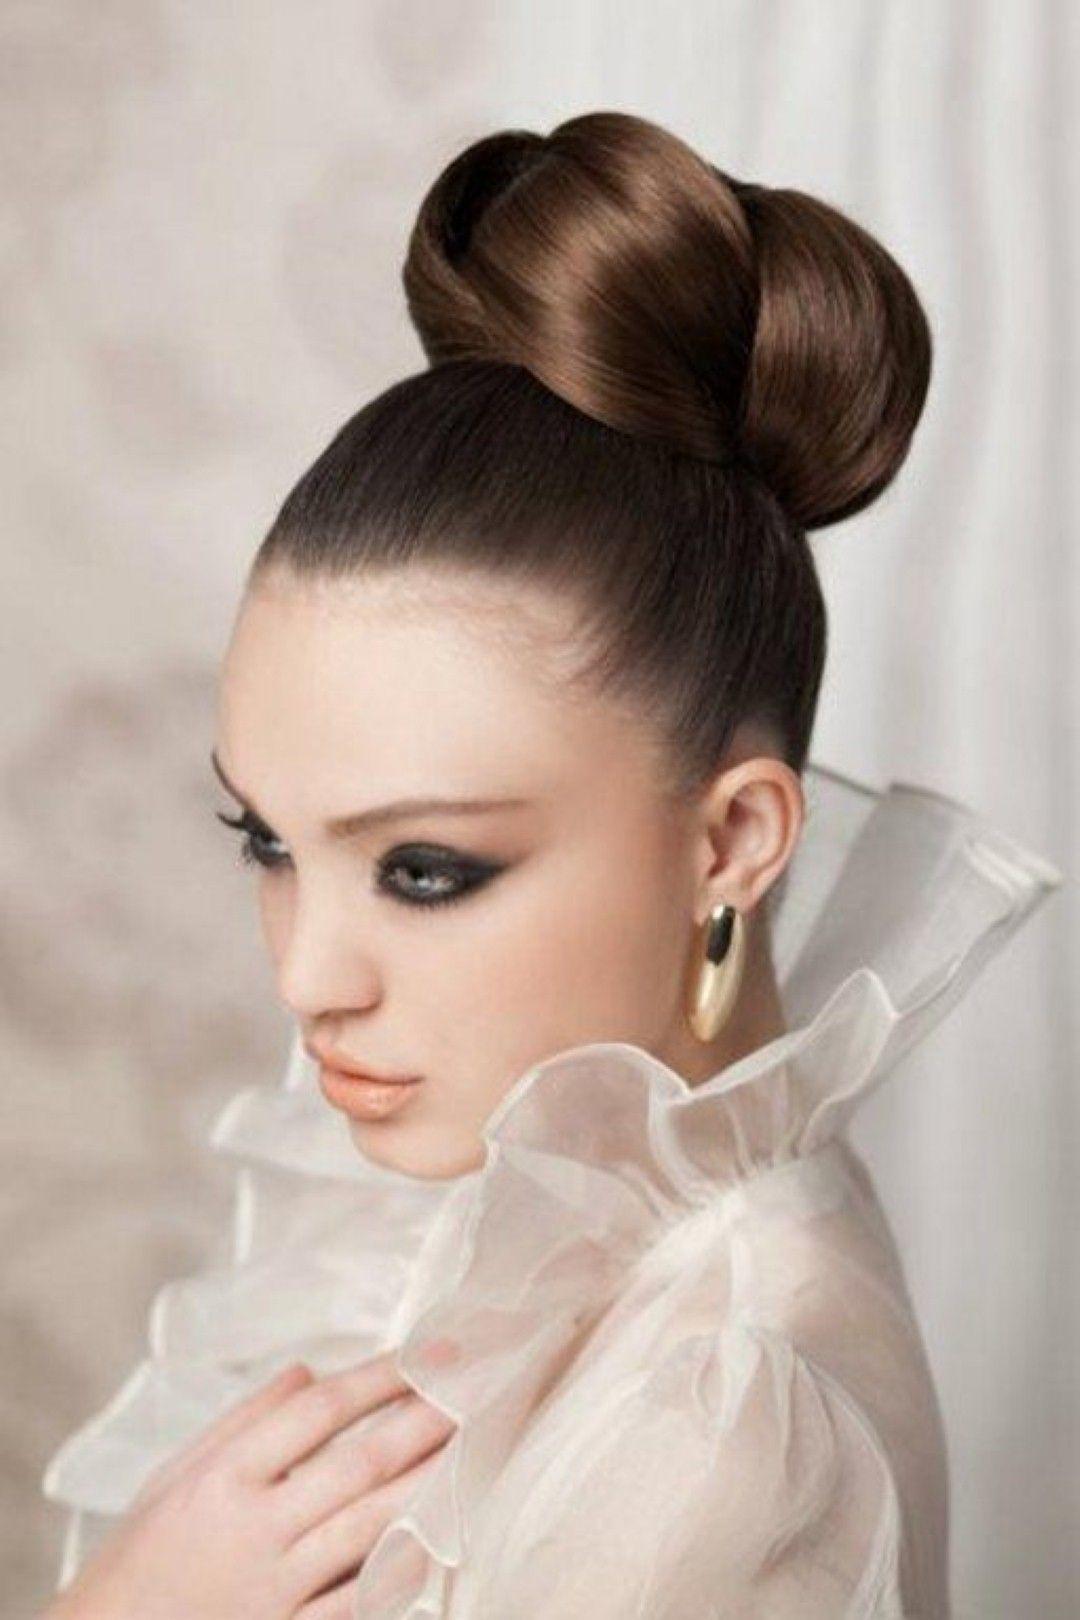 lovely long hairstyle for a wedding: ballerina bun | hair styles